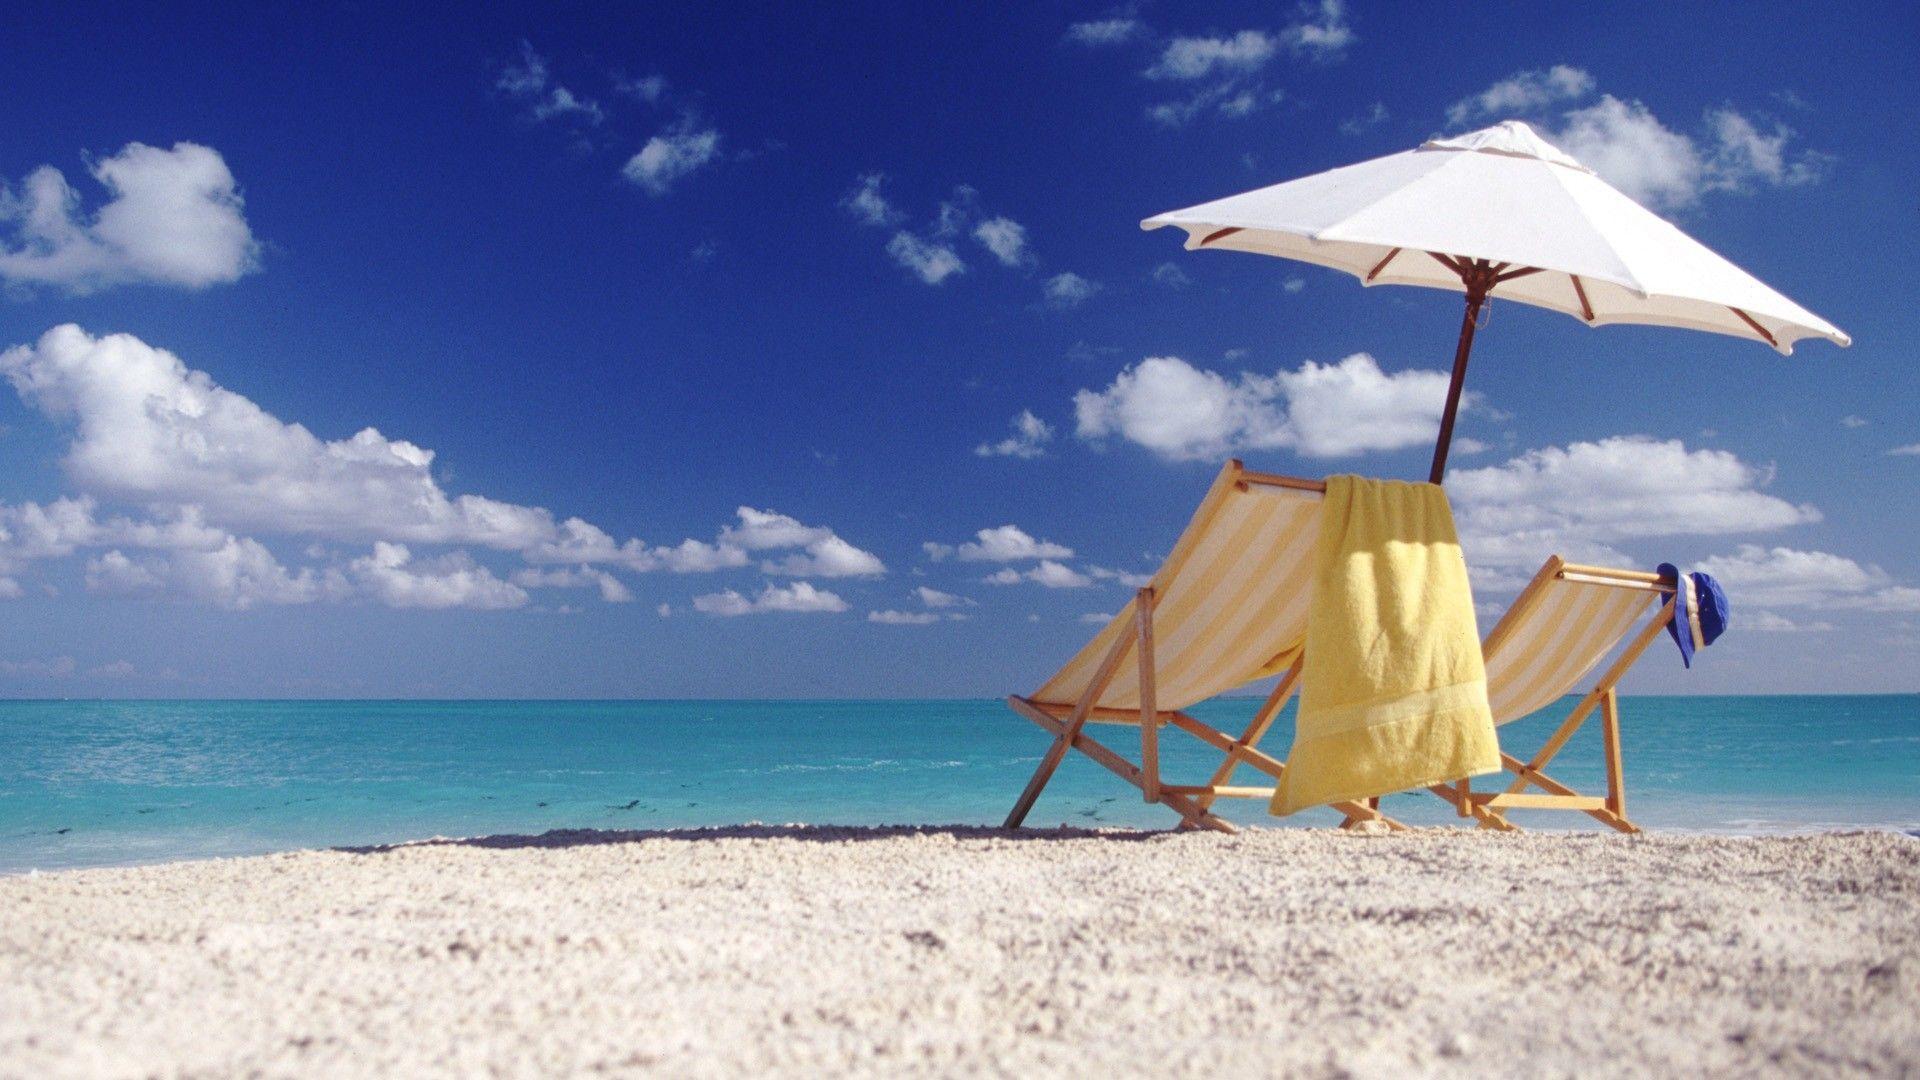 Beach with chairs - Beach Chairs Wallpaper Wide 12205 Wallpaper Wallpaper Screen